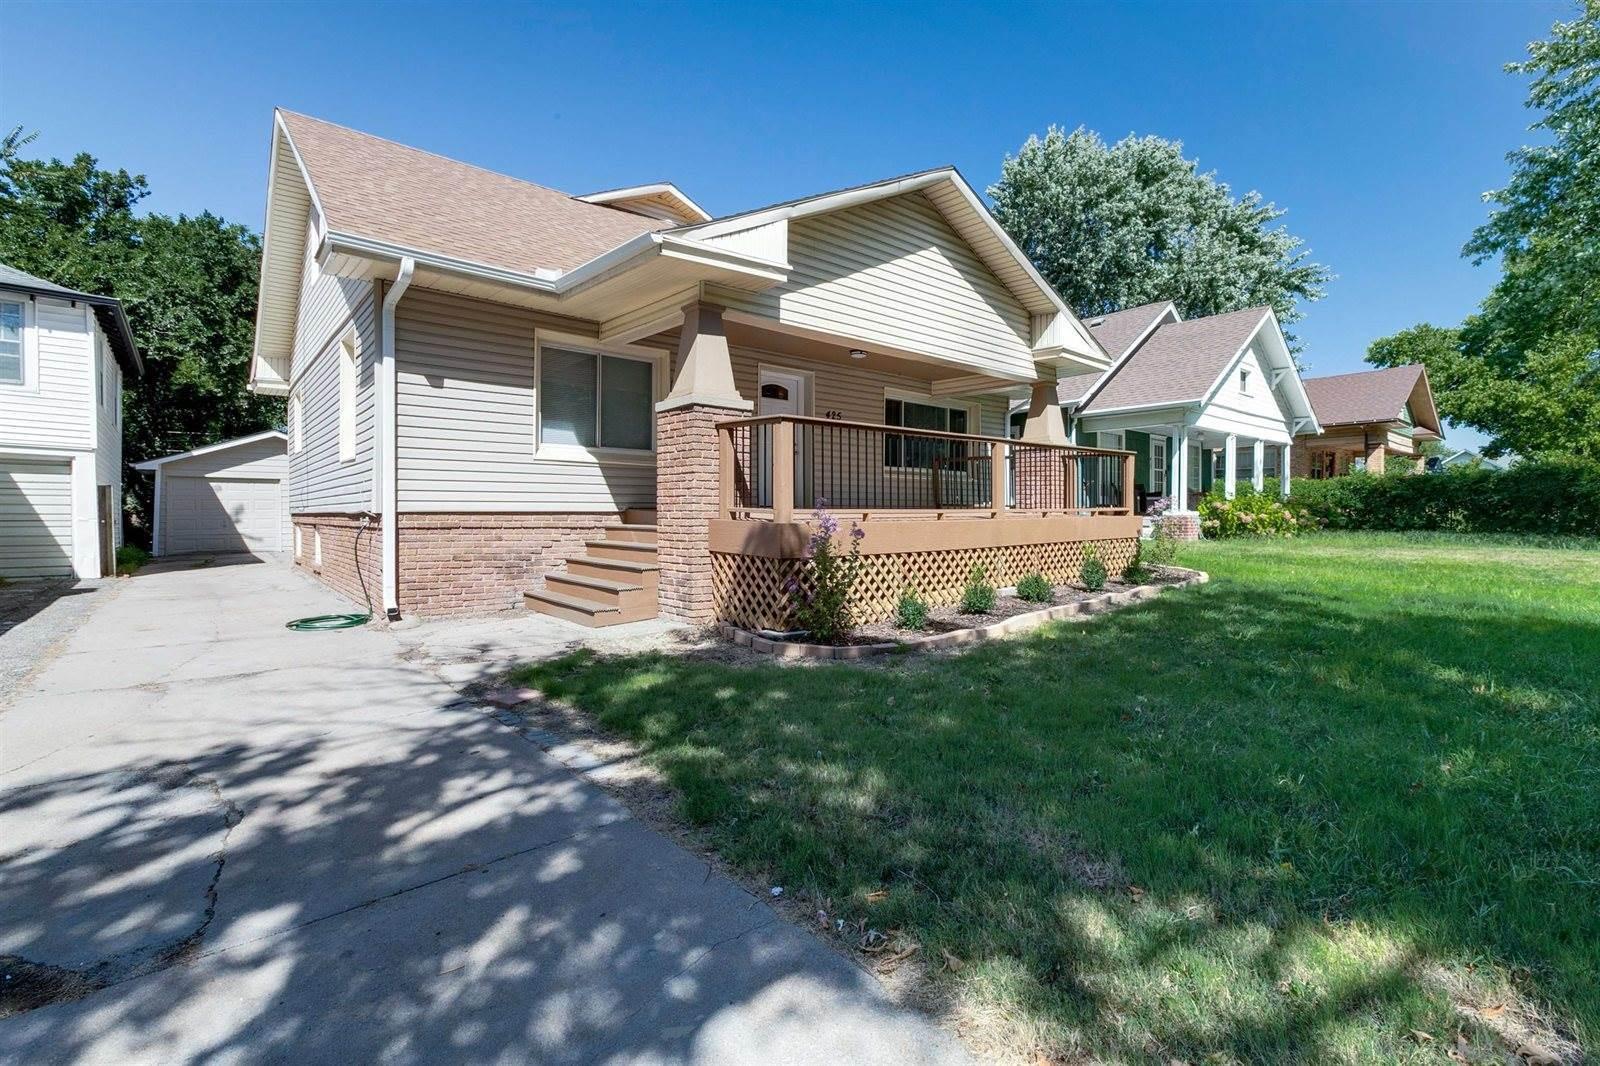 425 S Clifton Ave, Wichita, KS 67218